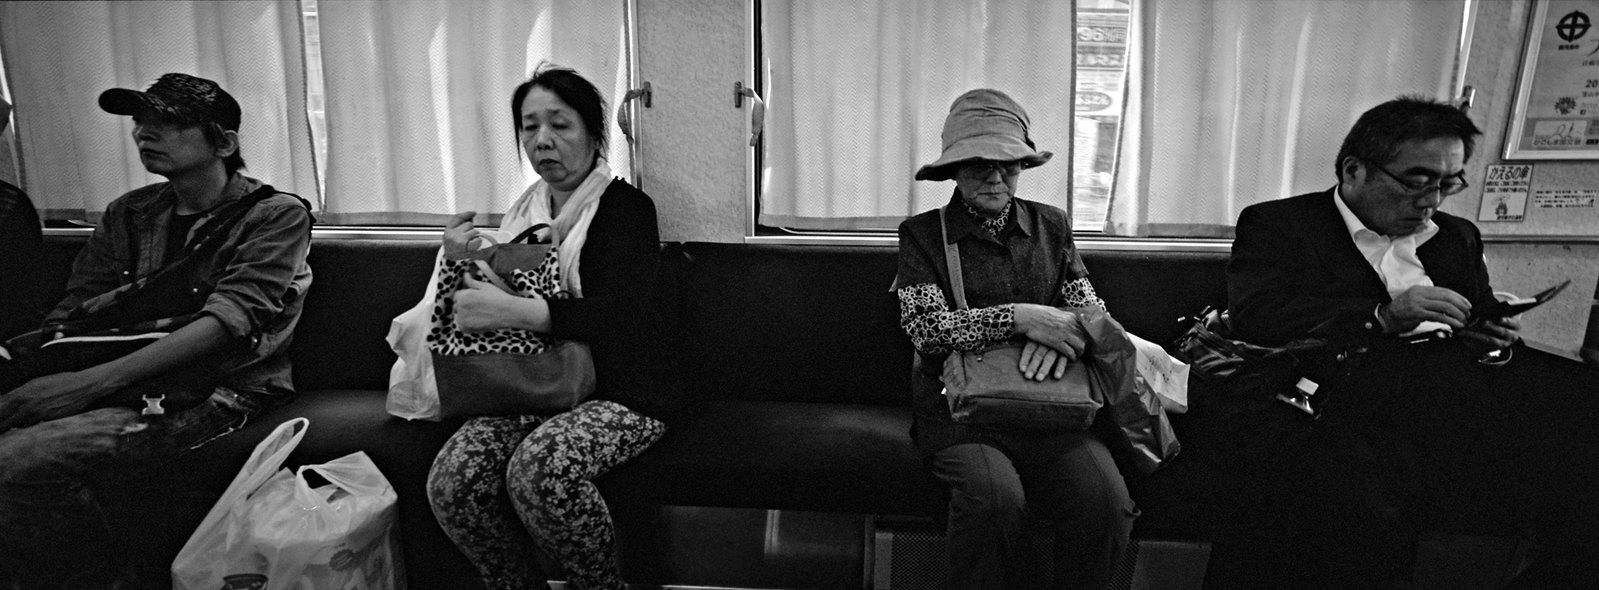 Commuters: Kagoshima